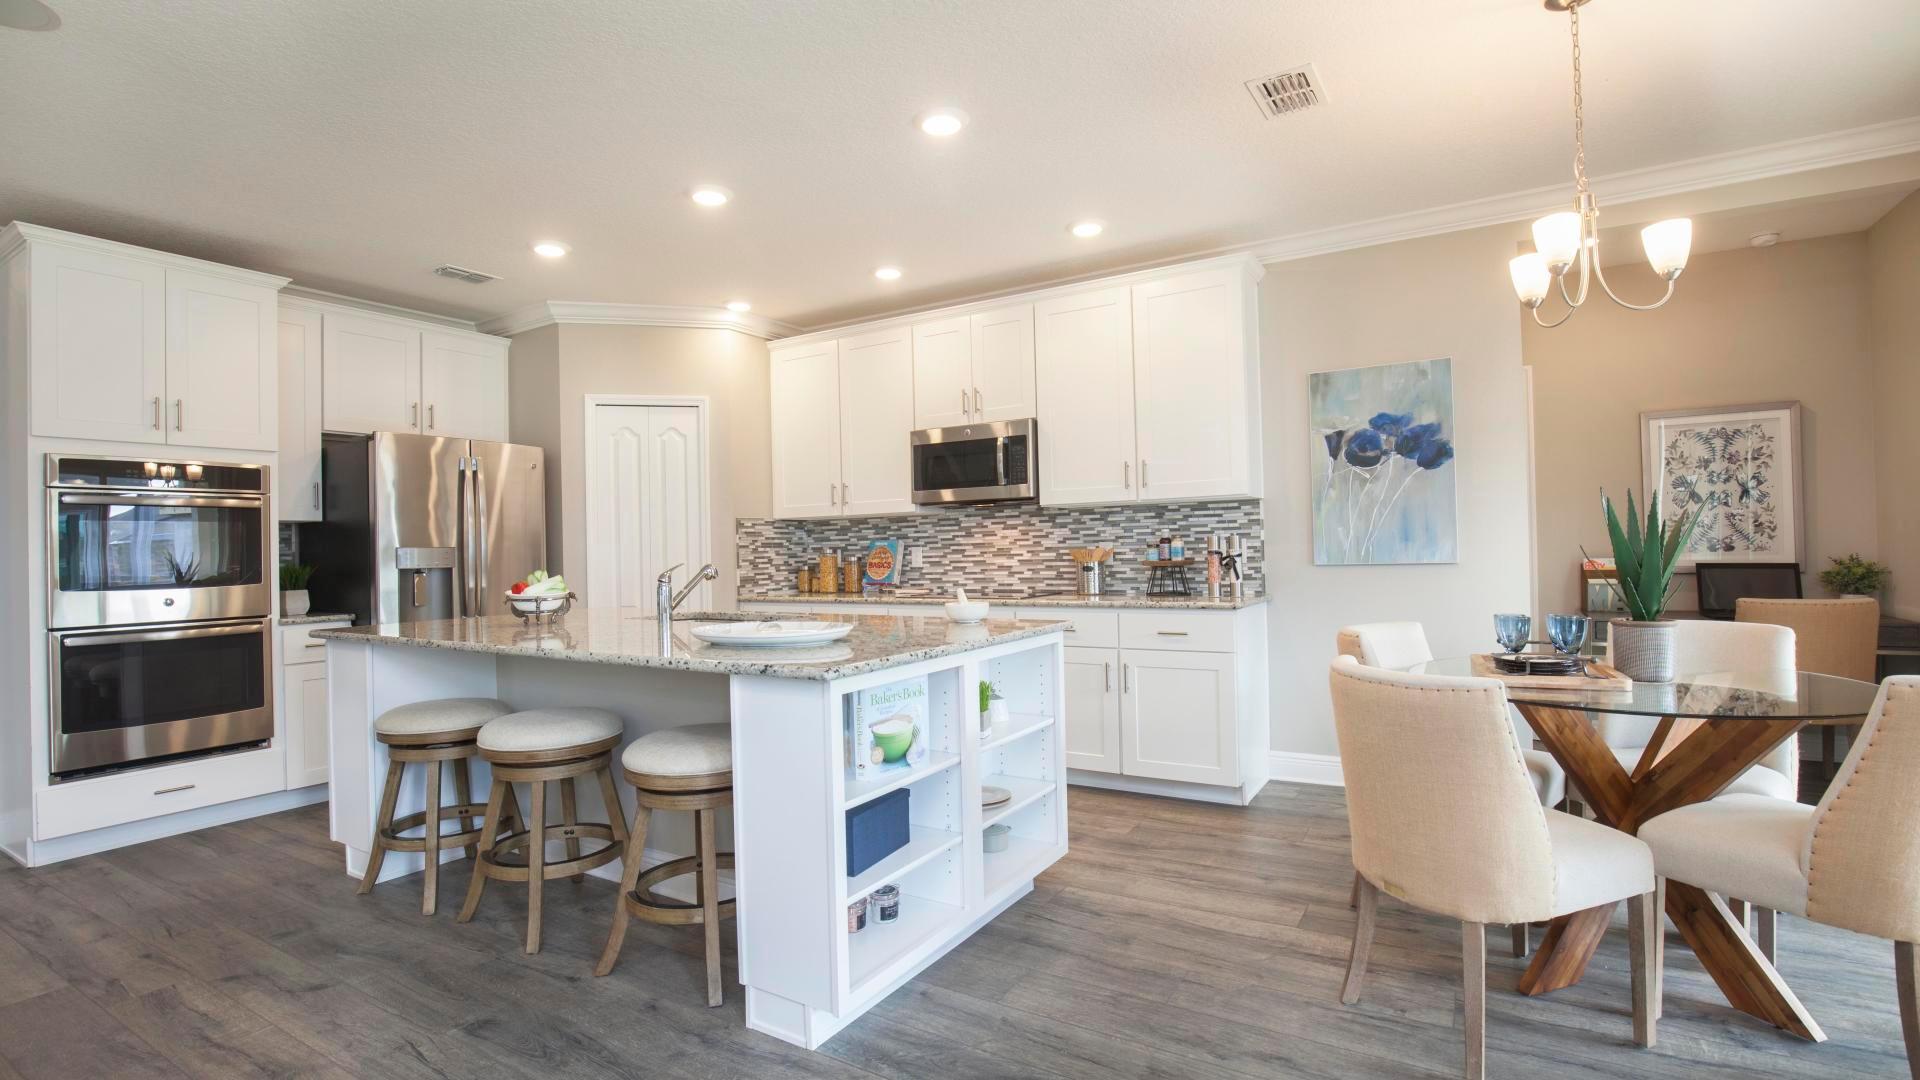 Kitchen featured in the Carlisle By Maronda Homes in Daytona Beach, FL